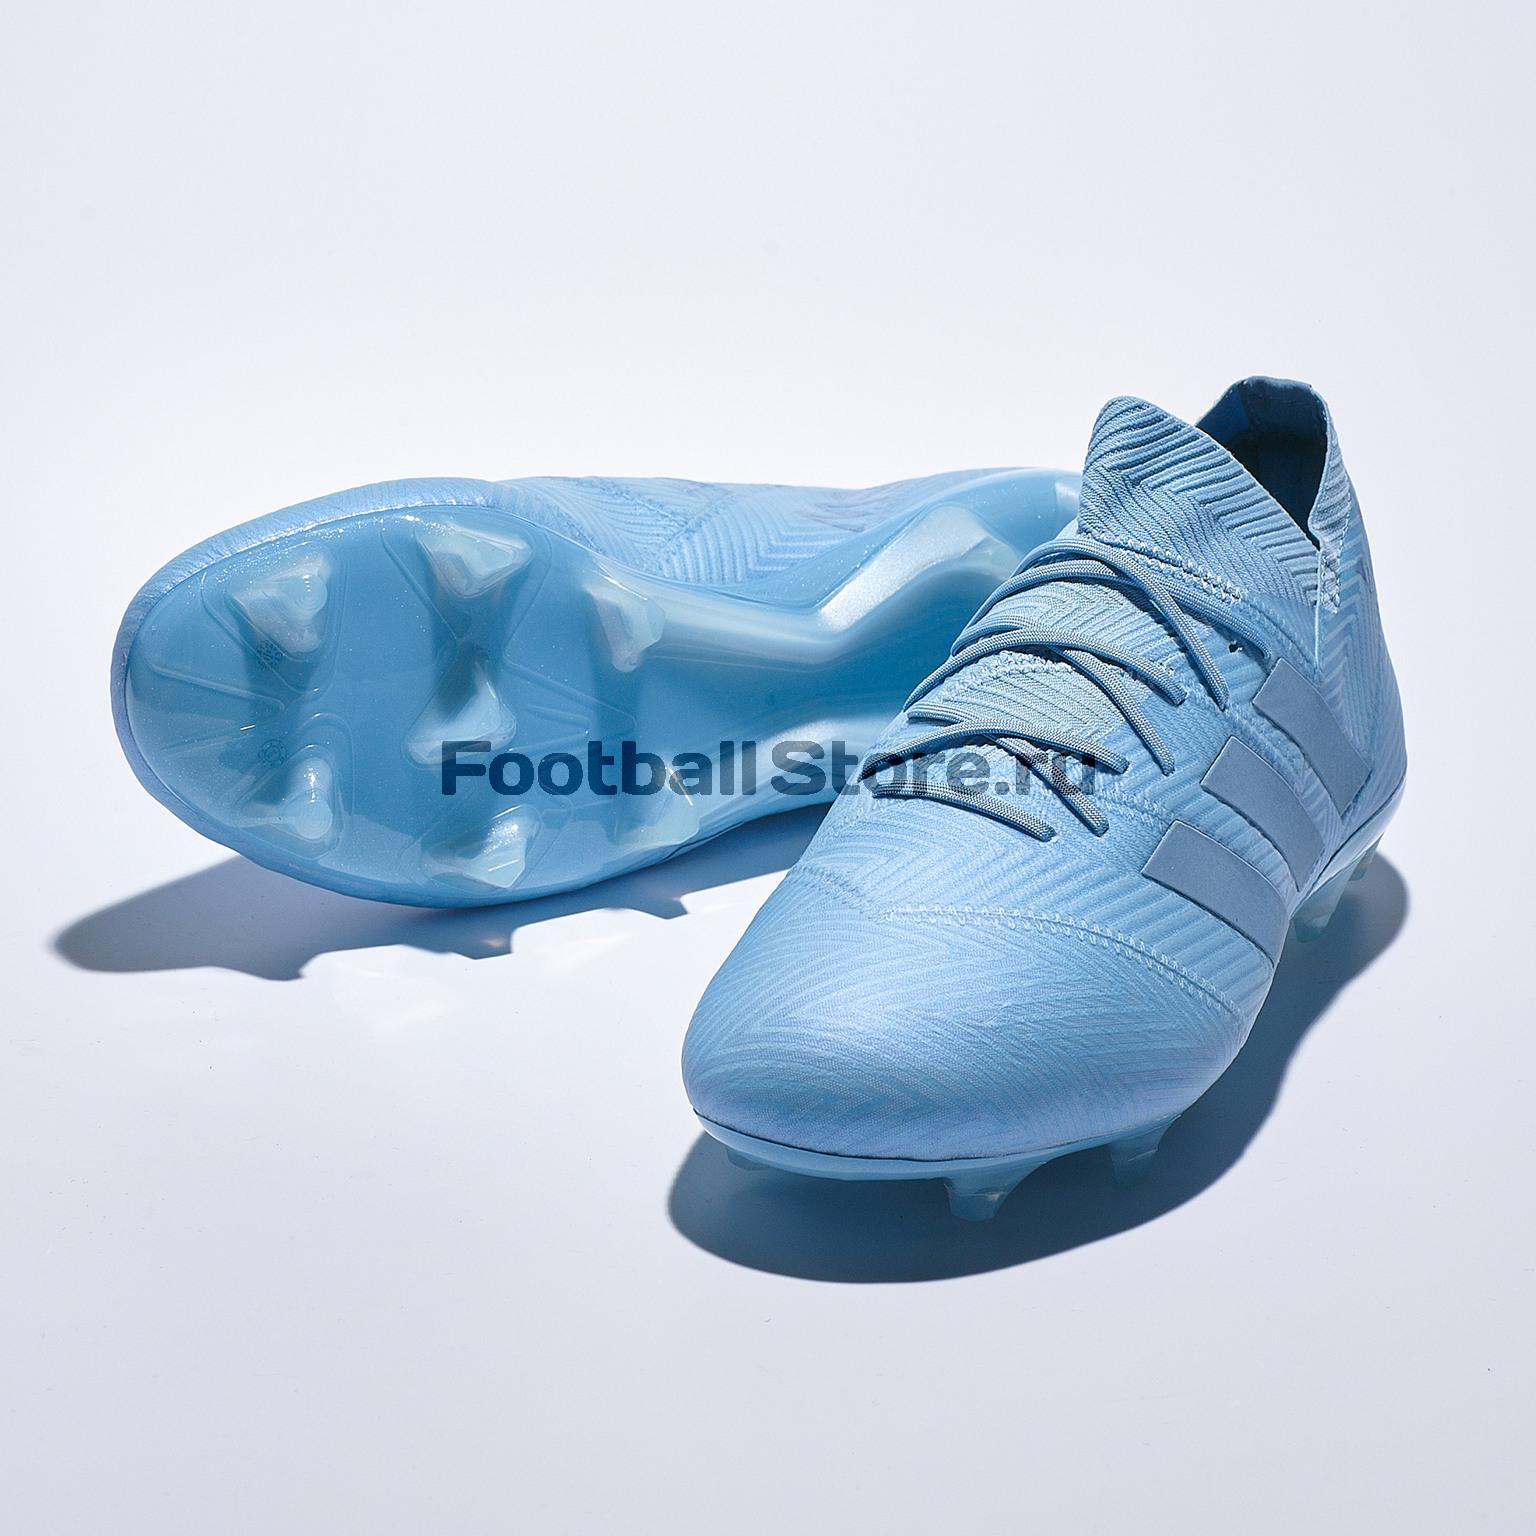 Бутсы Adidas Nemeziz Messi 18.1 FG DB2089 бутсы adidas messi 16 1 fg jr bb3852